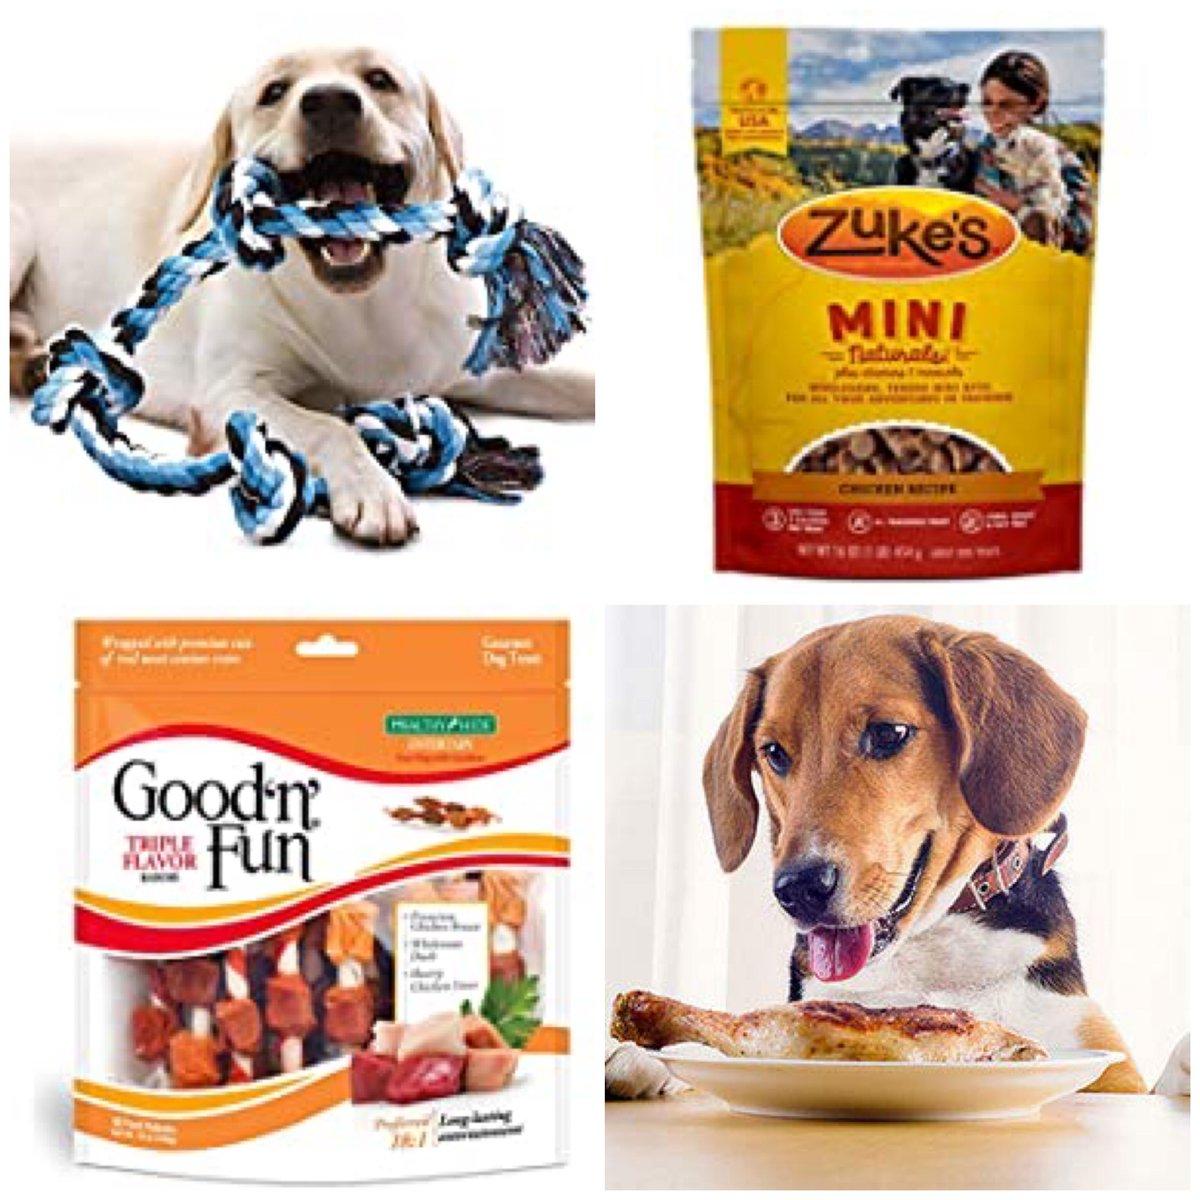 Treats - Dogs: Pet Supplies: Cookies, Biscuits & Snacks, Rawhide, Bones, Jerky,  Bully Sticks & More   https://buff.ly/2C9K9fe    Amazon  #dog #pet #petsupplies #dogs   #doglife  #doglove  Click here for pet supplies https://buff.ly/2AtUvWzpic.twitter.com/gipaSPFOJ6